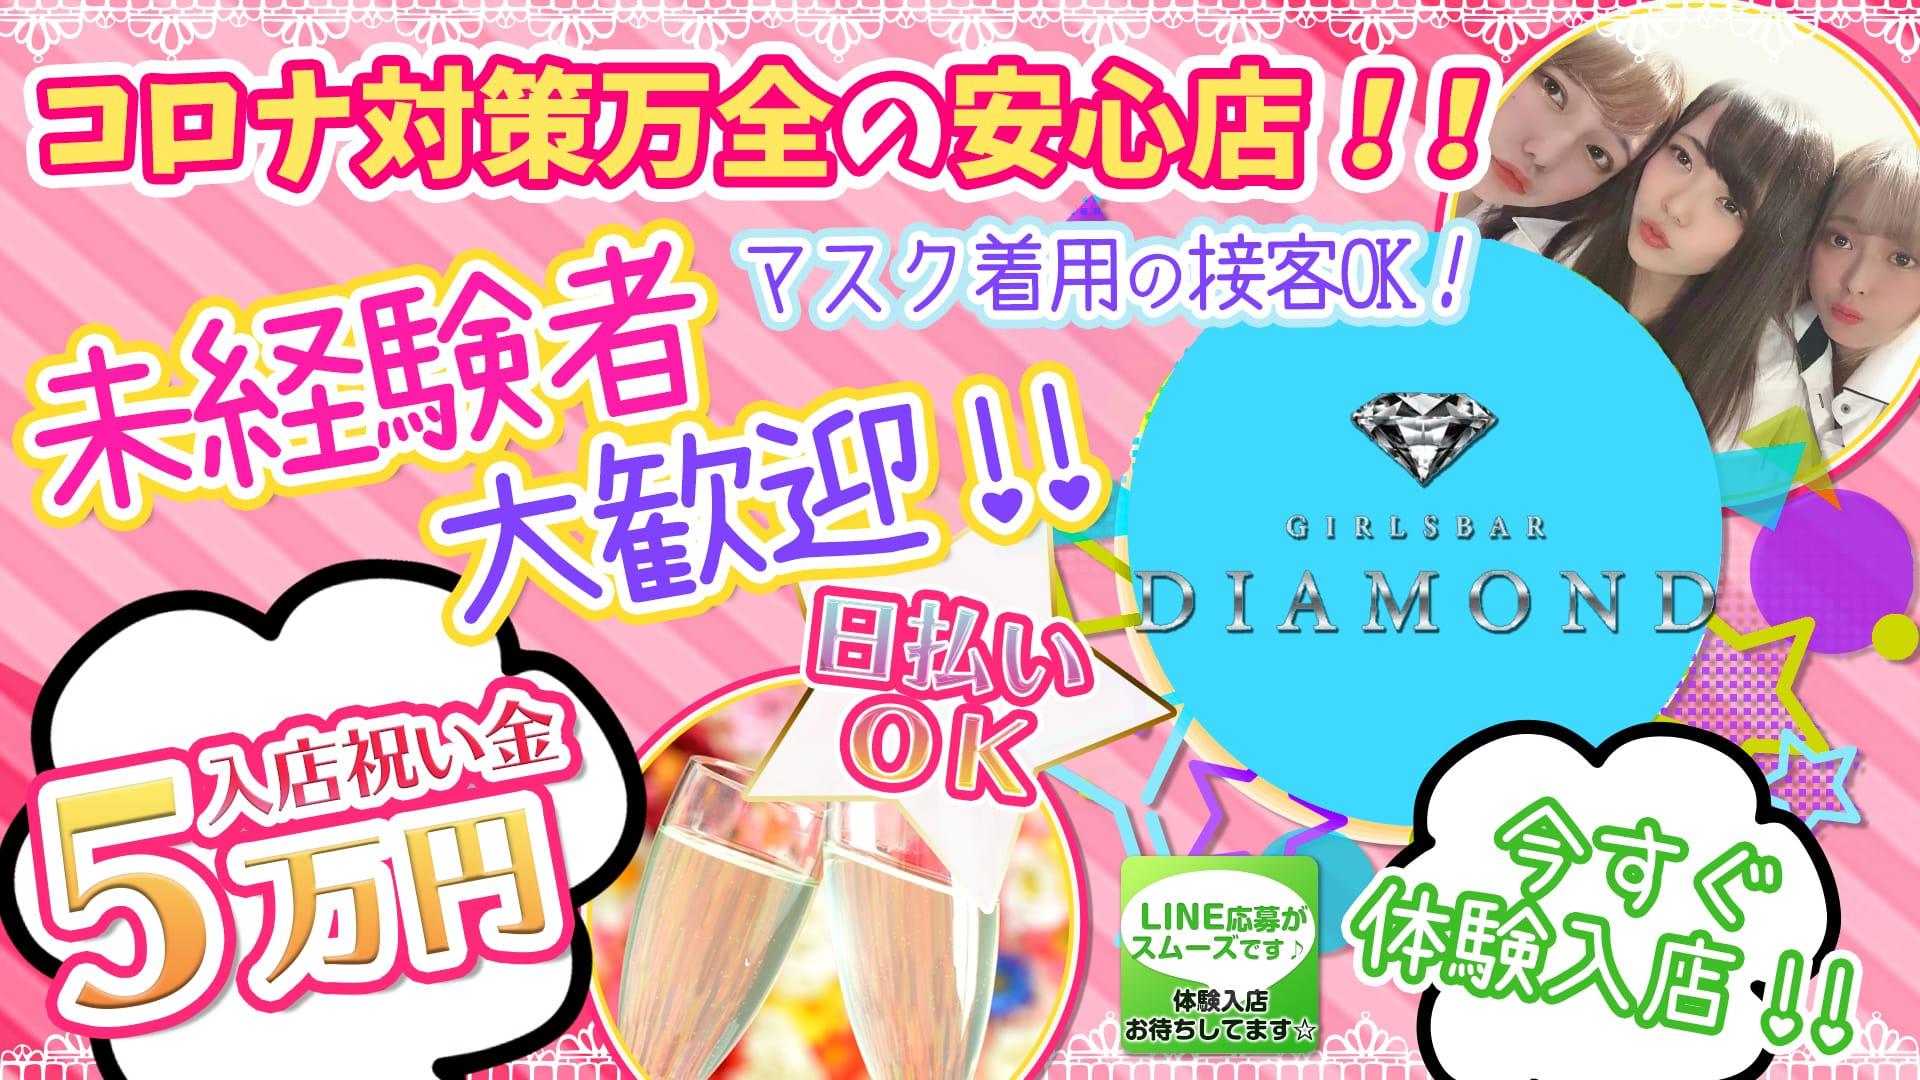 Diamond(ダイヤモンド) 池袋ガールズバー TOP画像